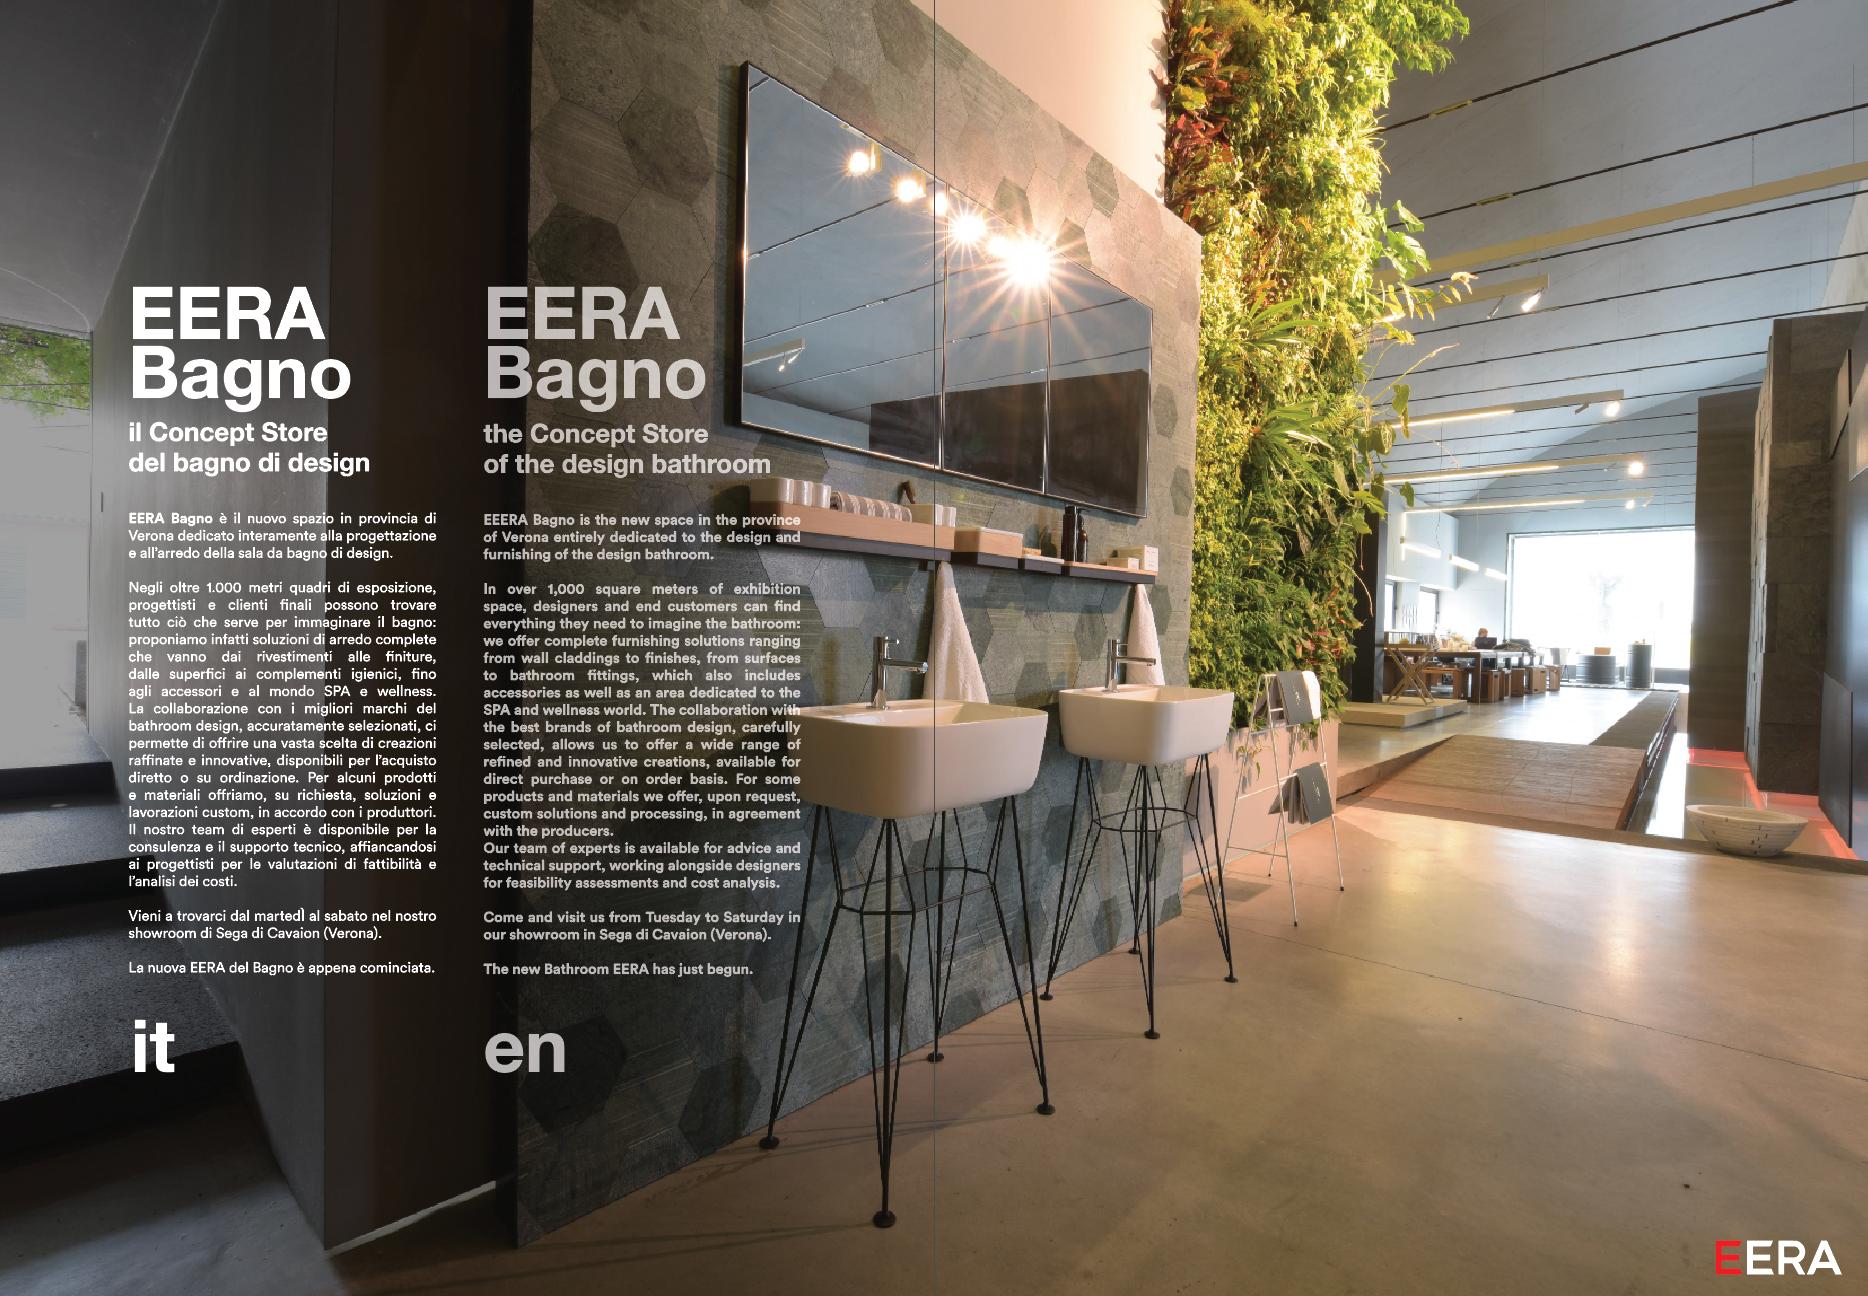 Luca Tognolo visual designer freelance - EERA magazine